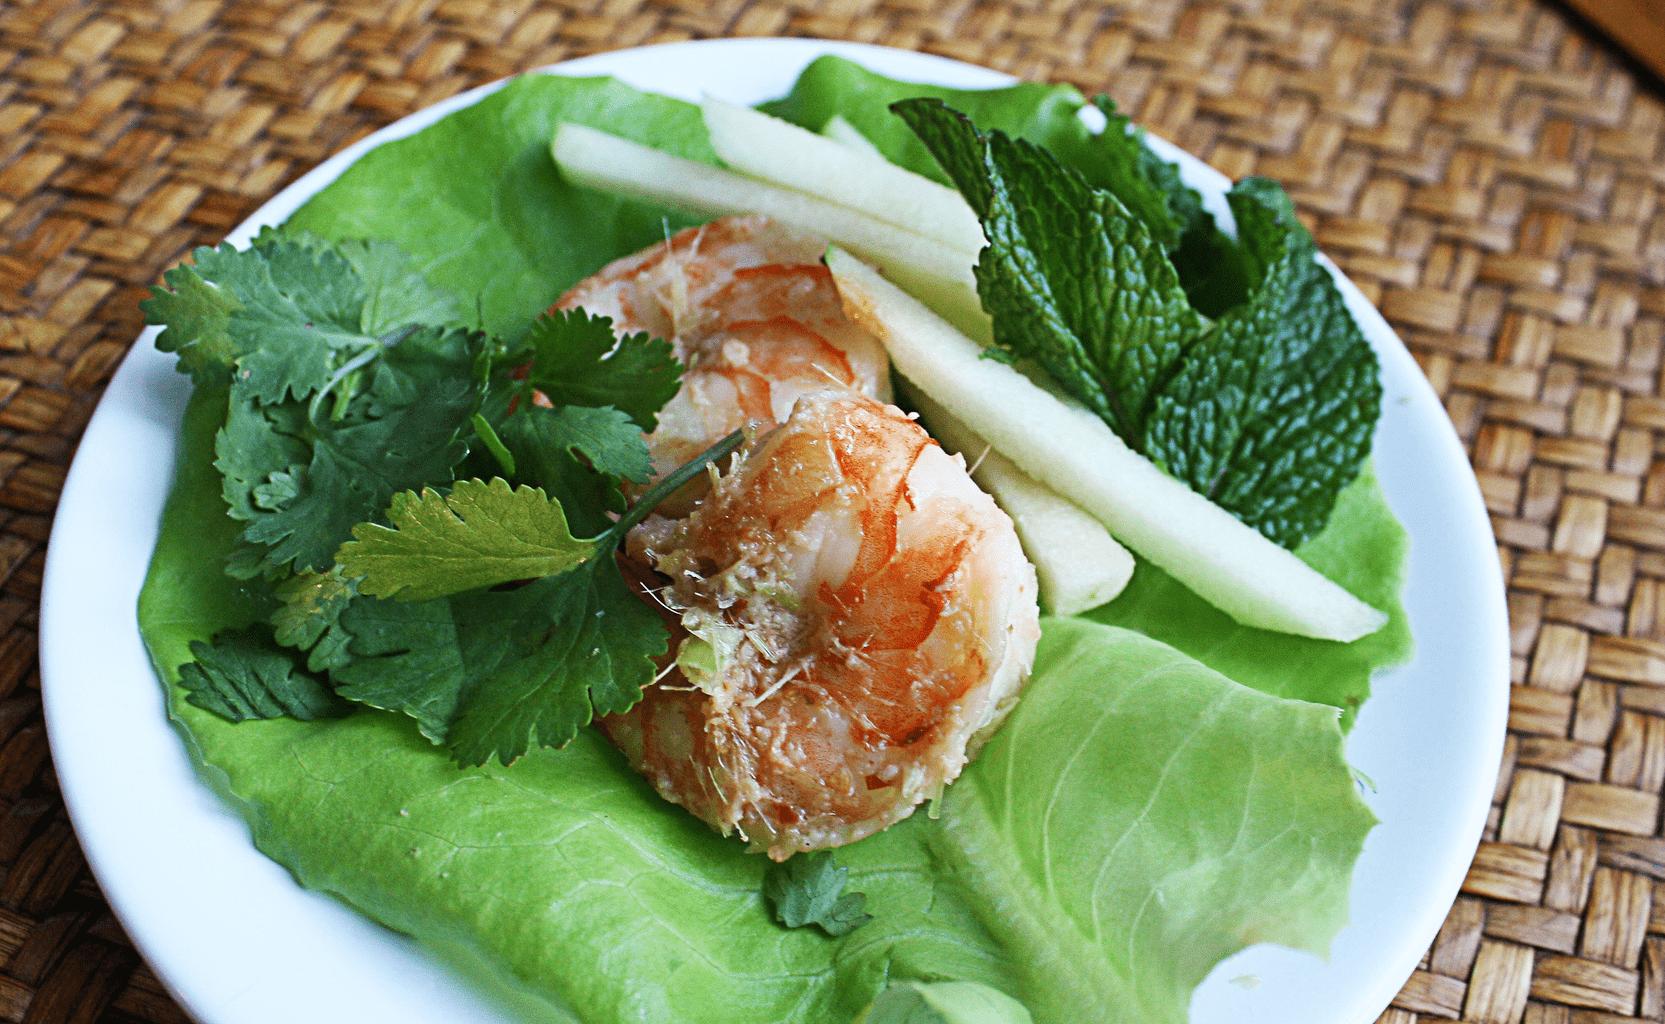 Lemongrass Shrimp with Minted Apples